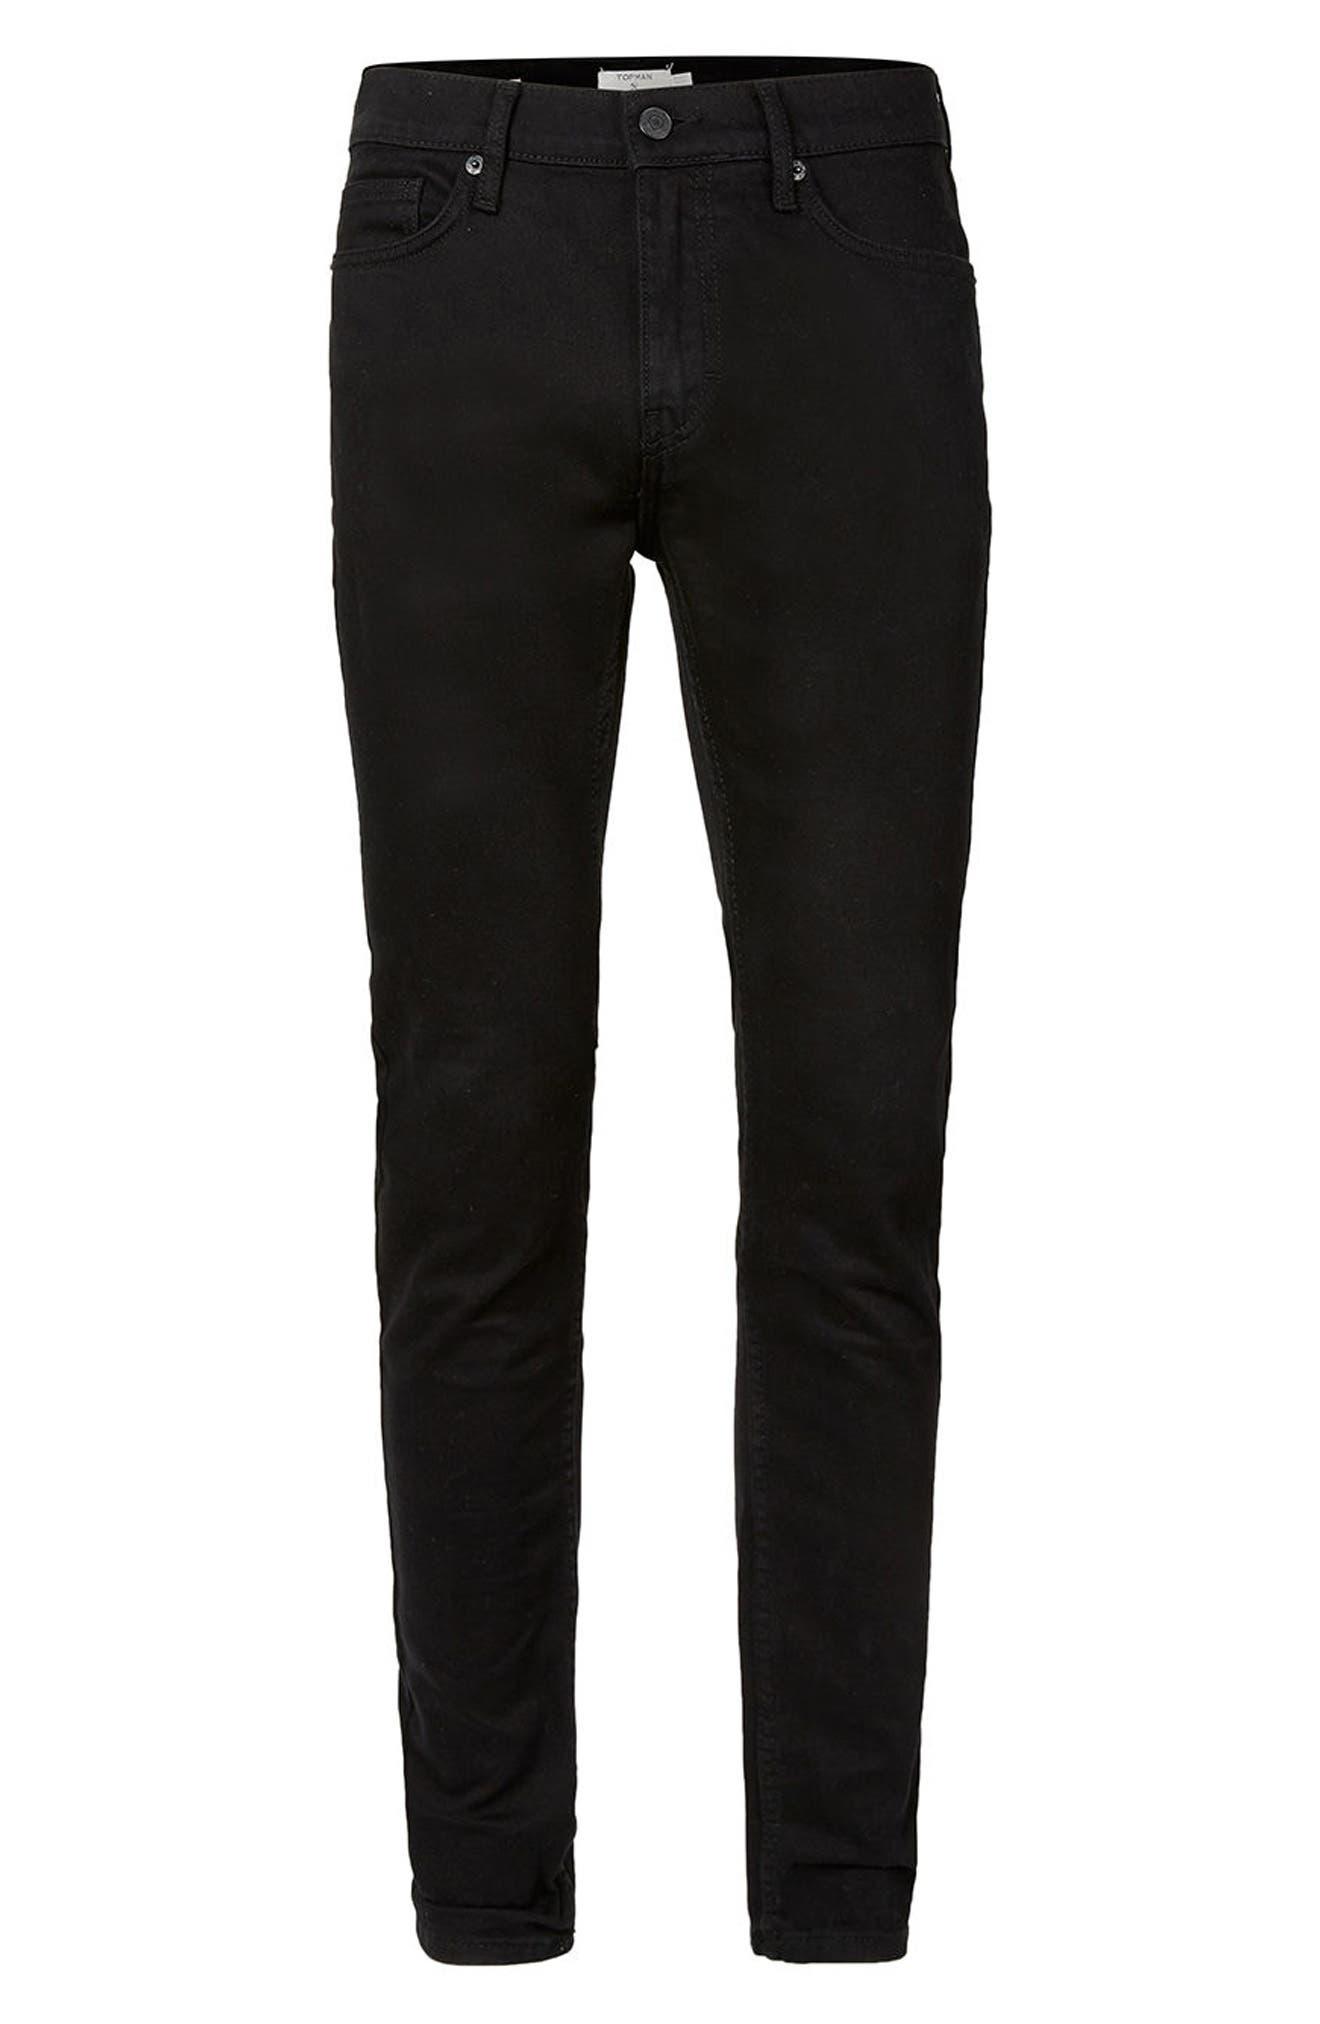 Skinny Stretch Jeans,                             Alternate thumbnail 4, color,                             BLACK